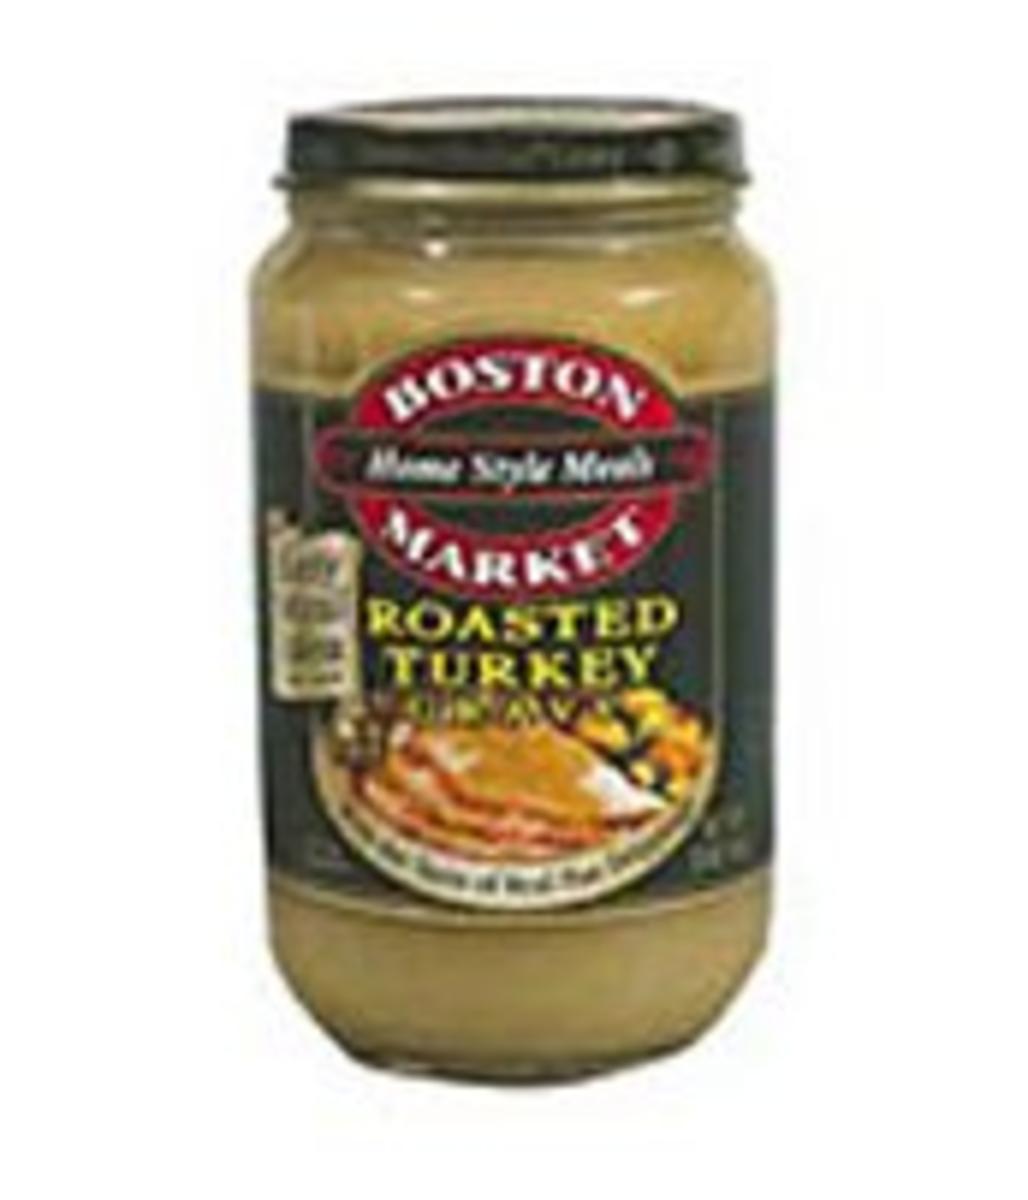 Easy Side Dishes - Boston Market Roasted Turkey Gravy